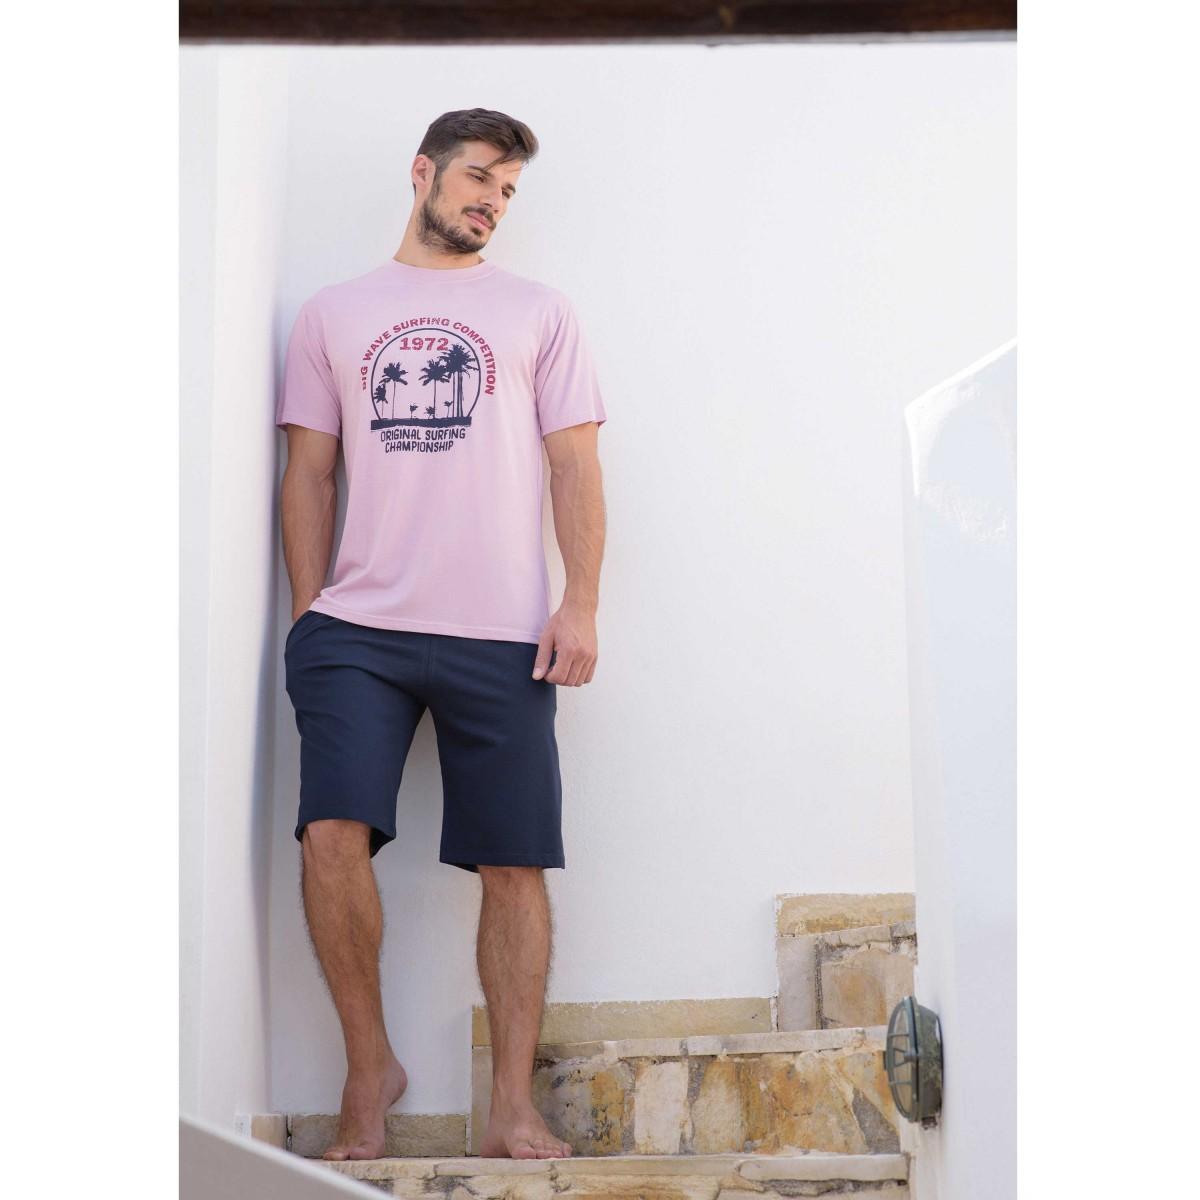 254f518d0a2 Ανδρική Βαμβακερή Πυτζάμα με μονόχρωμη μπλέ βερμούδα και λιλά μπλουζάκι με  ...